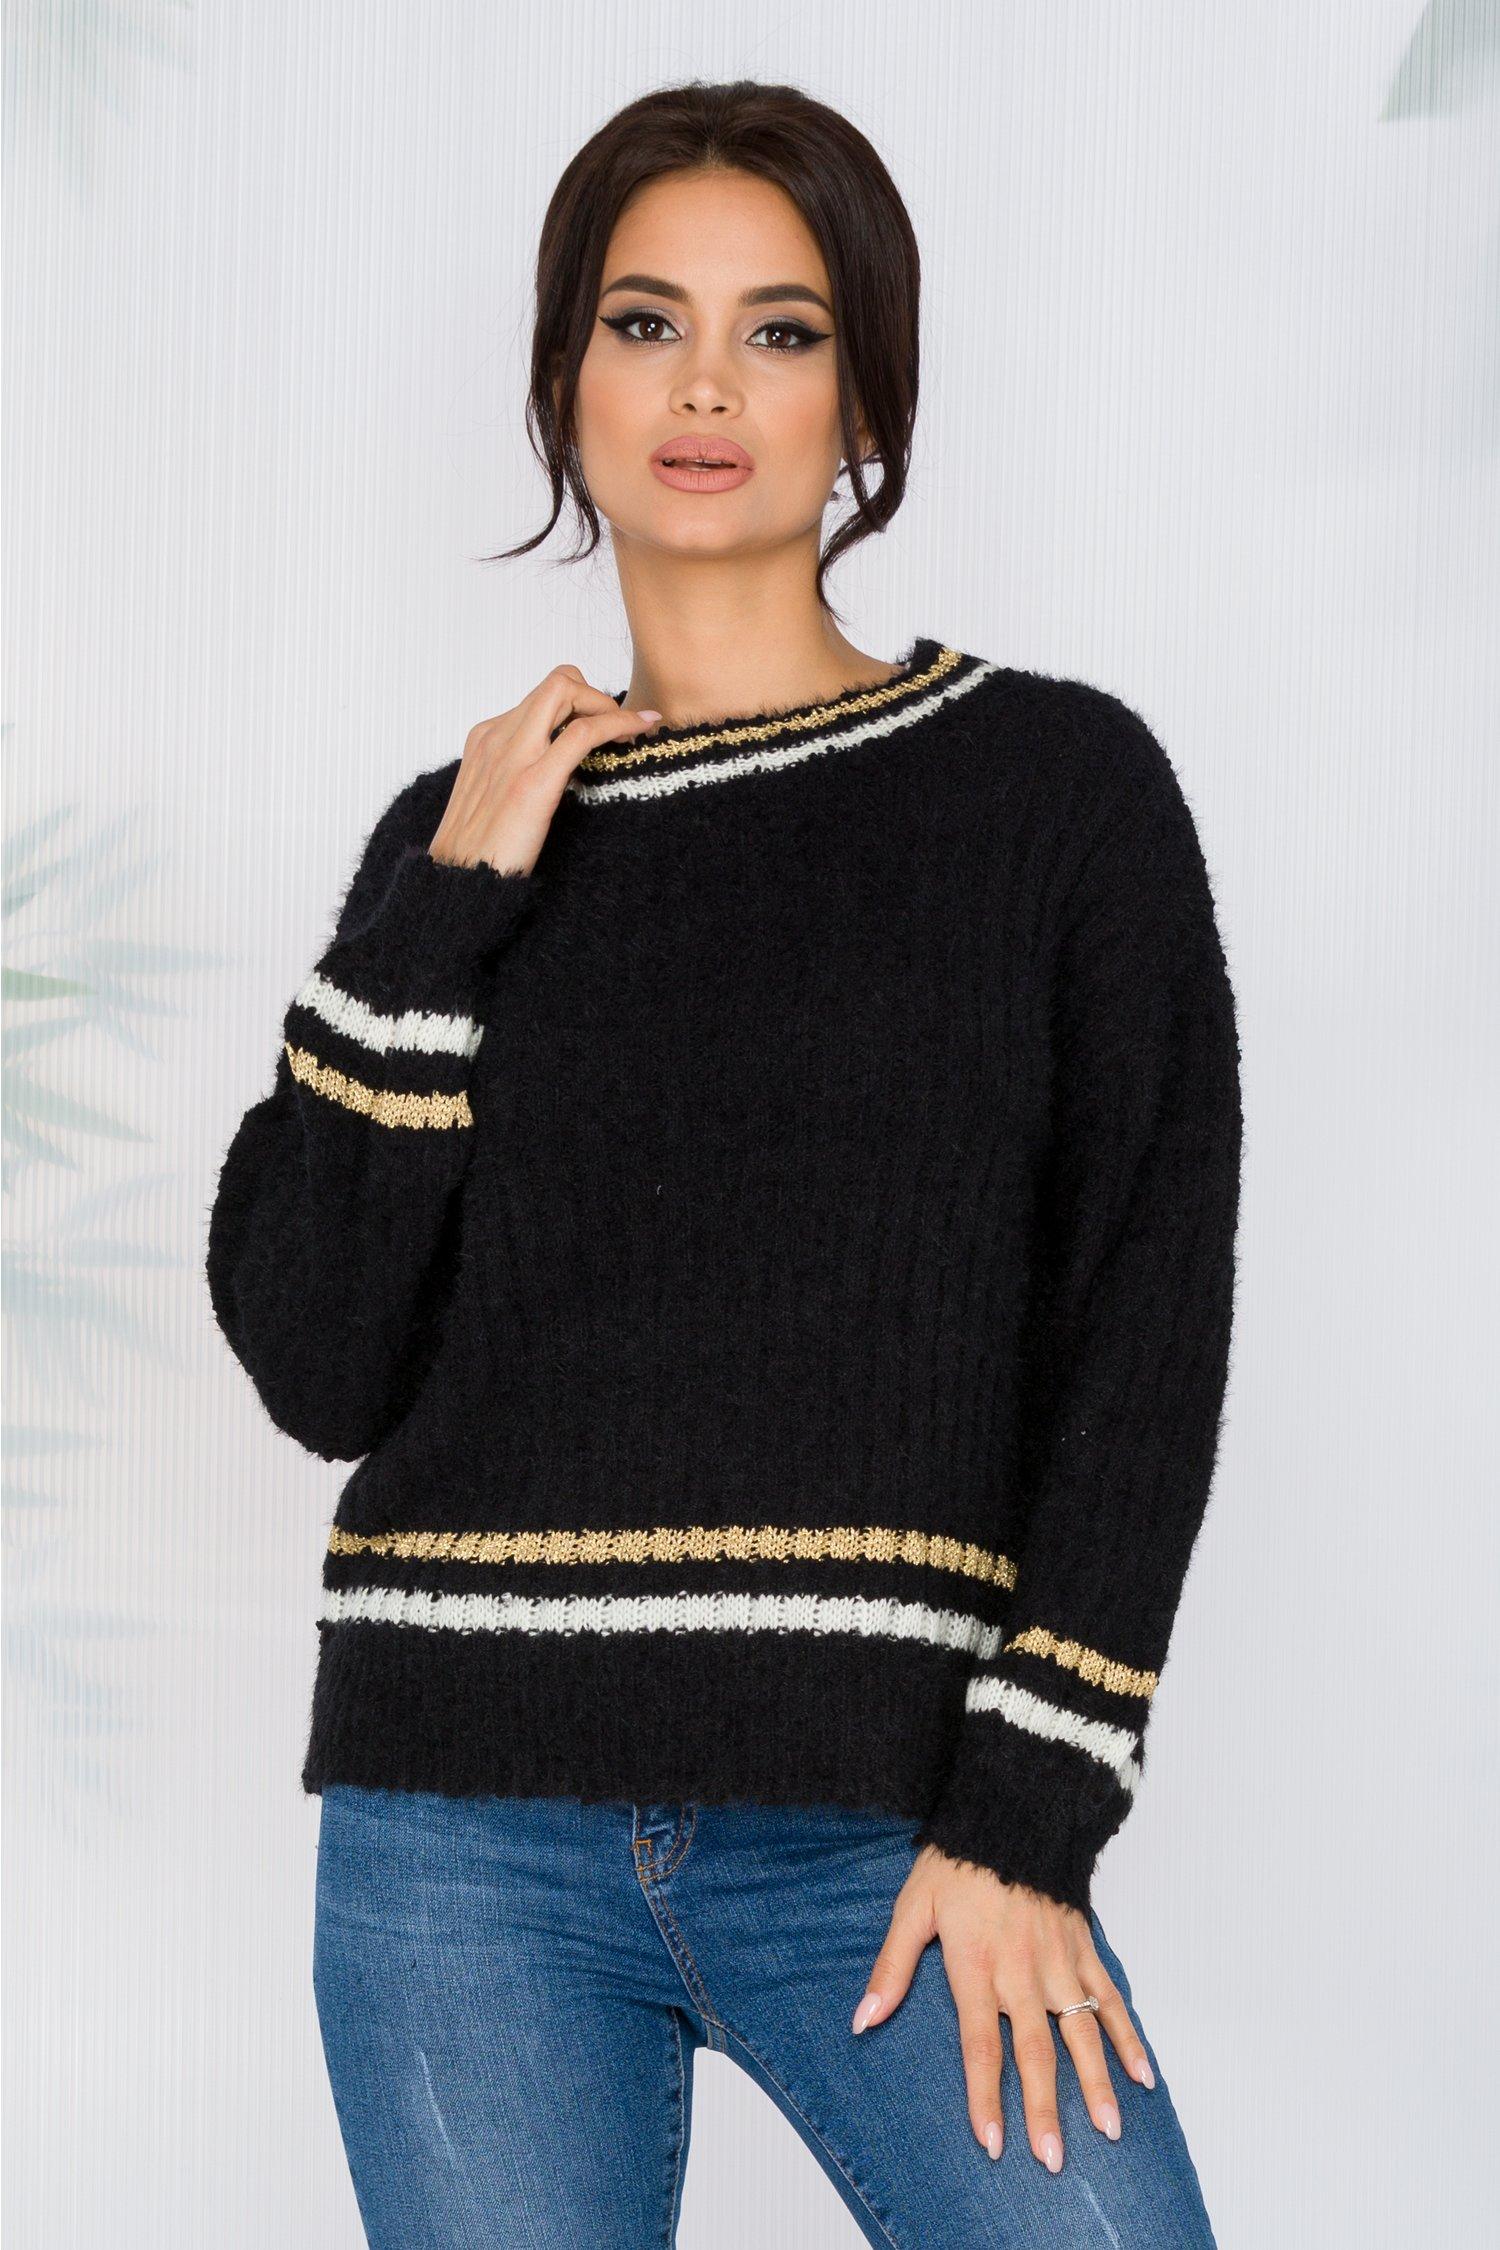 Bluza Simina neagra din tricot pufos cu dungi albe si aurii